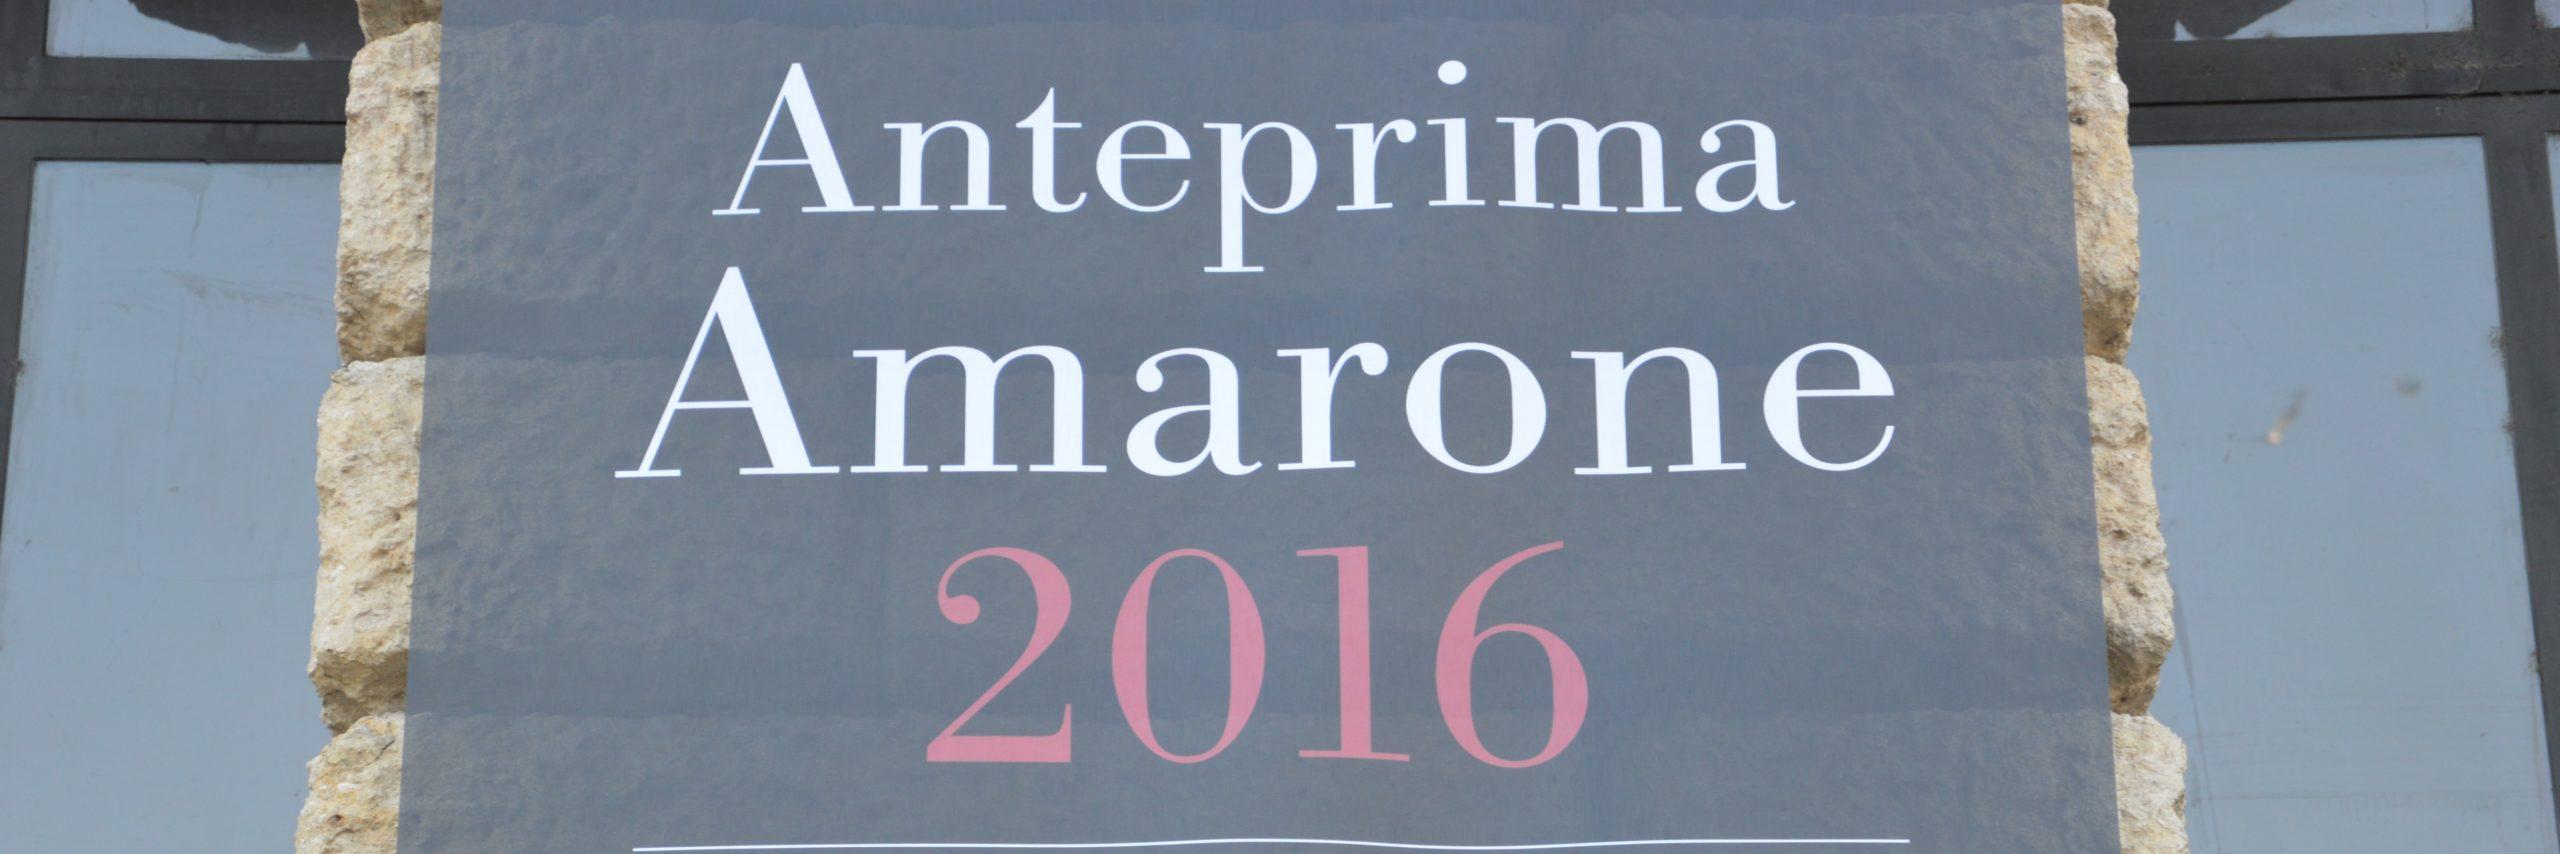 Anteprima Amarone 2016: L'eleganza del re